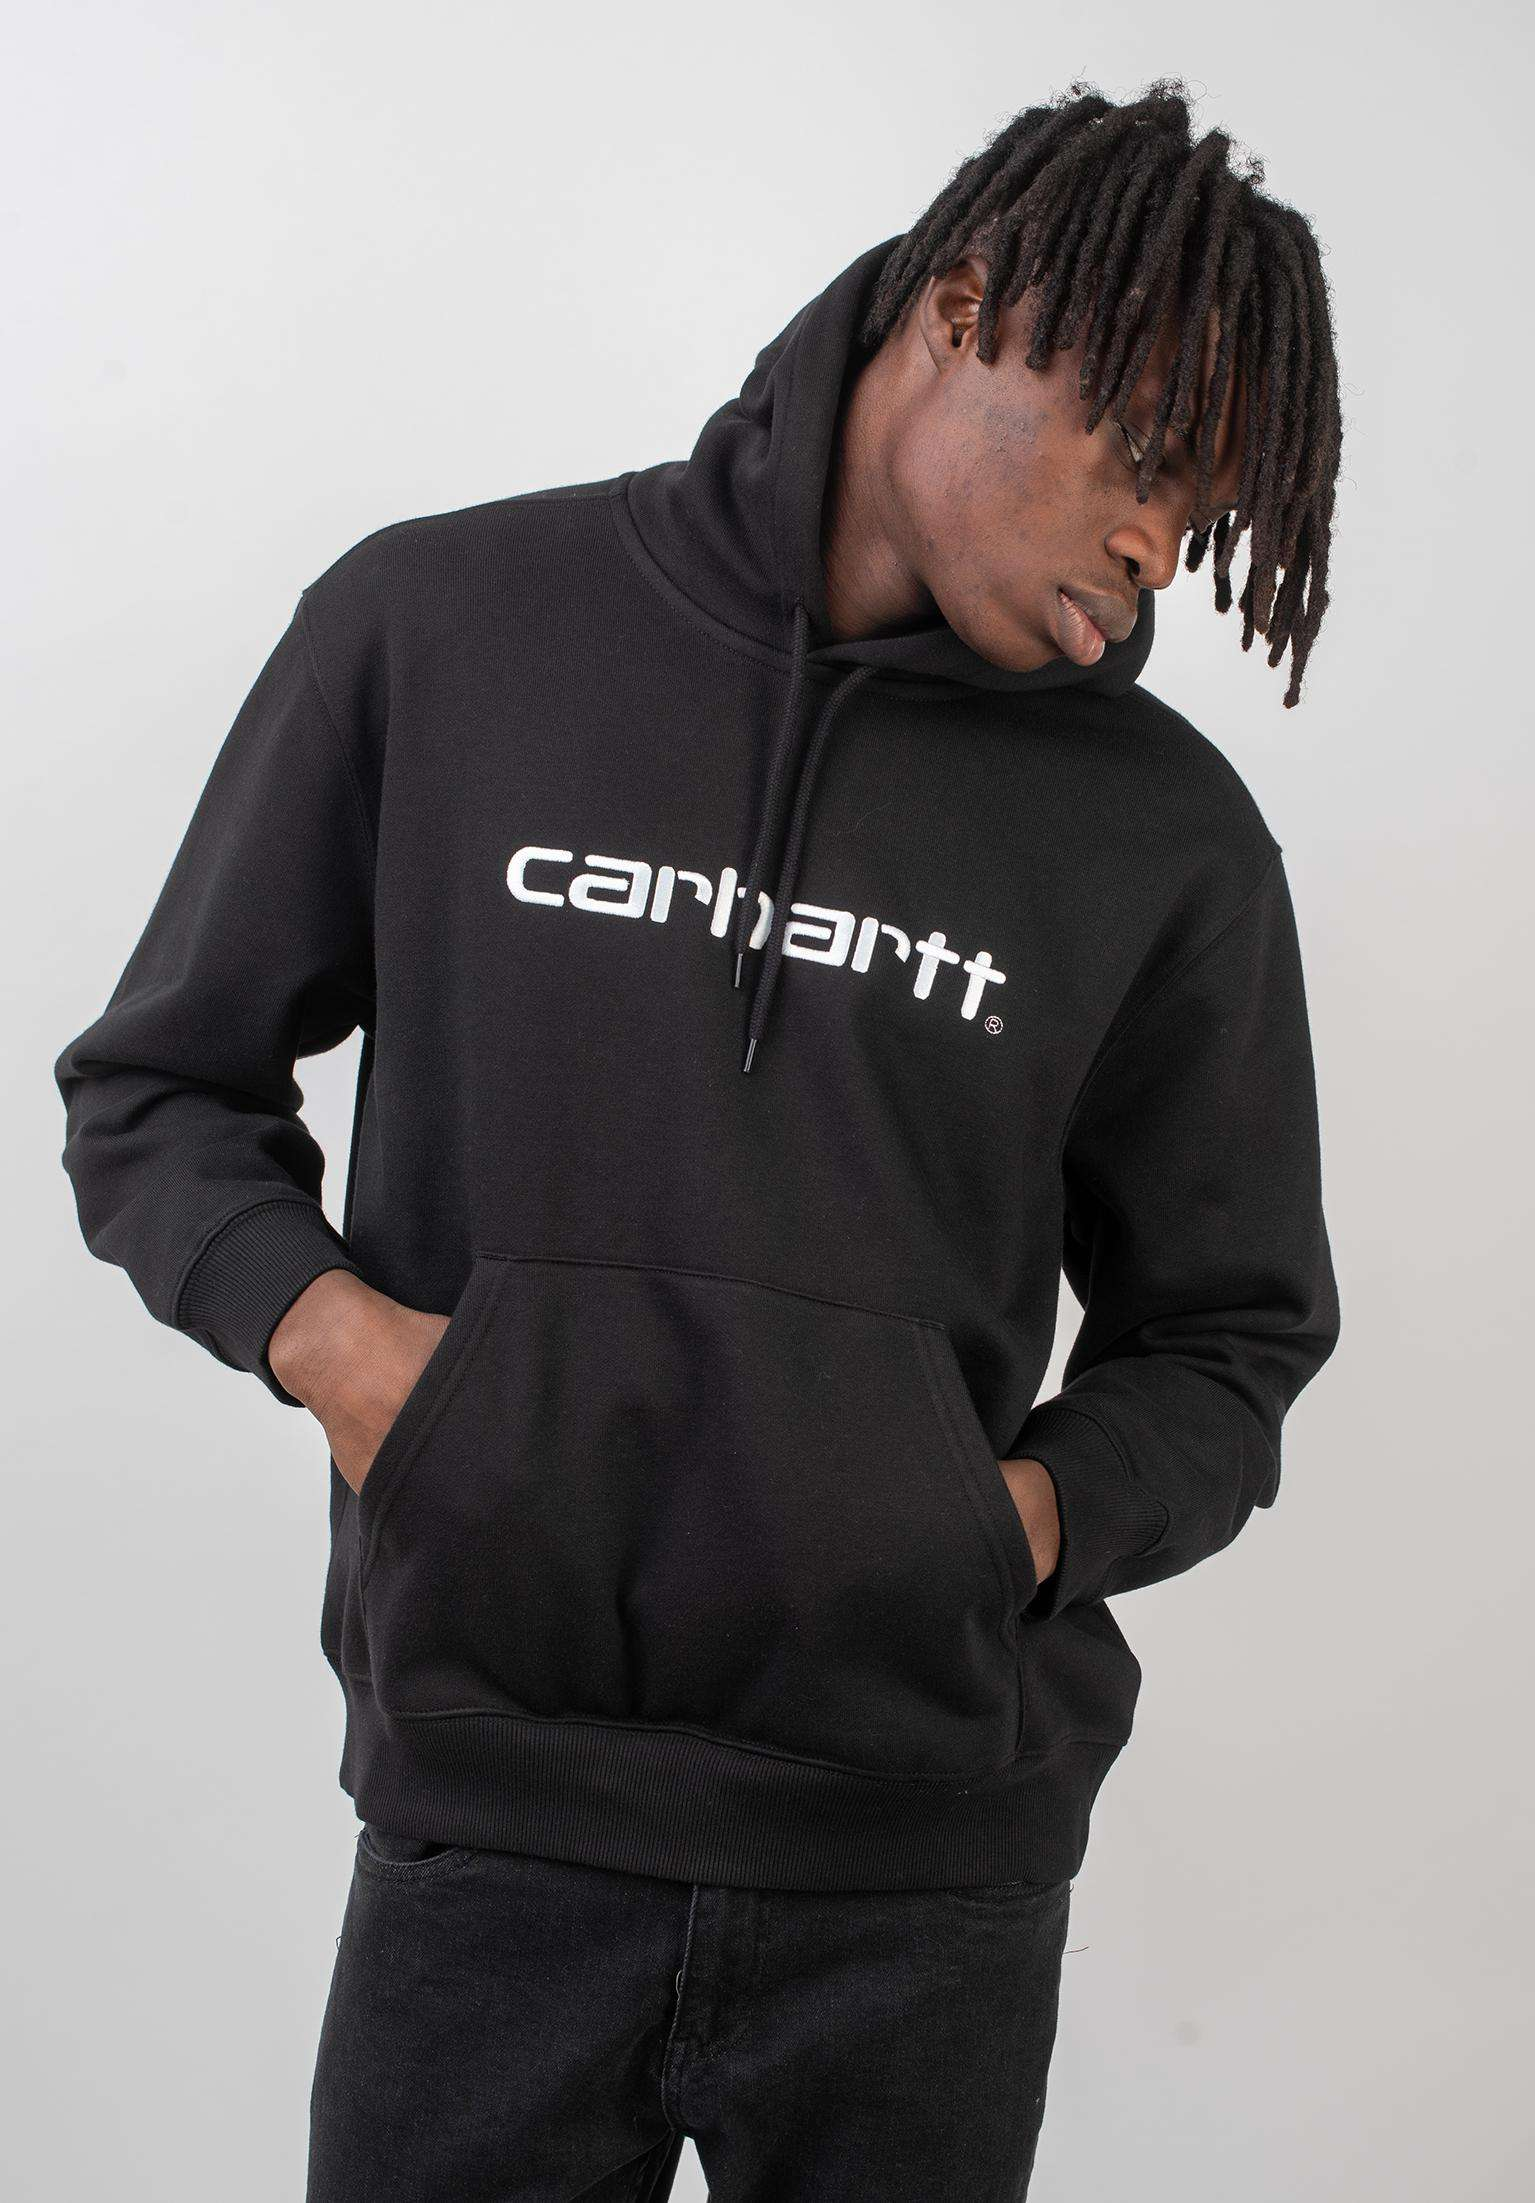 8c6fc8e2de3 Hooded Carhartt Sweatshirt Carhartt WIP Hoodies in black-white for Men |  Titus